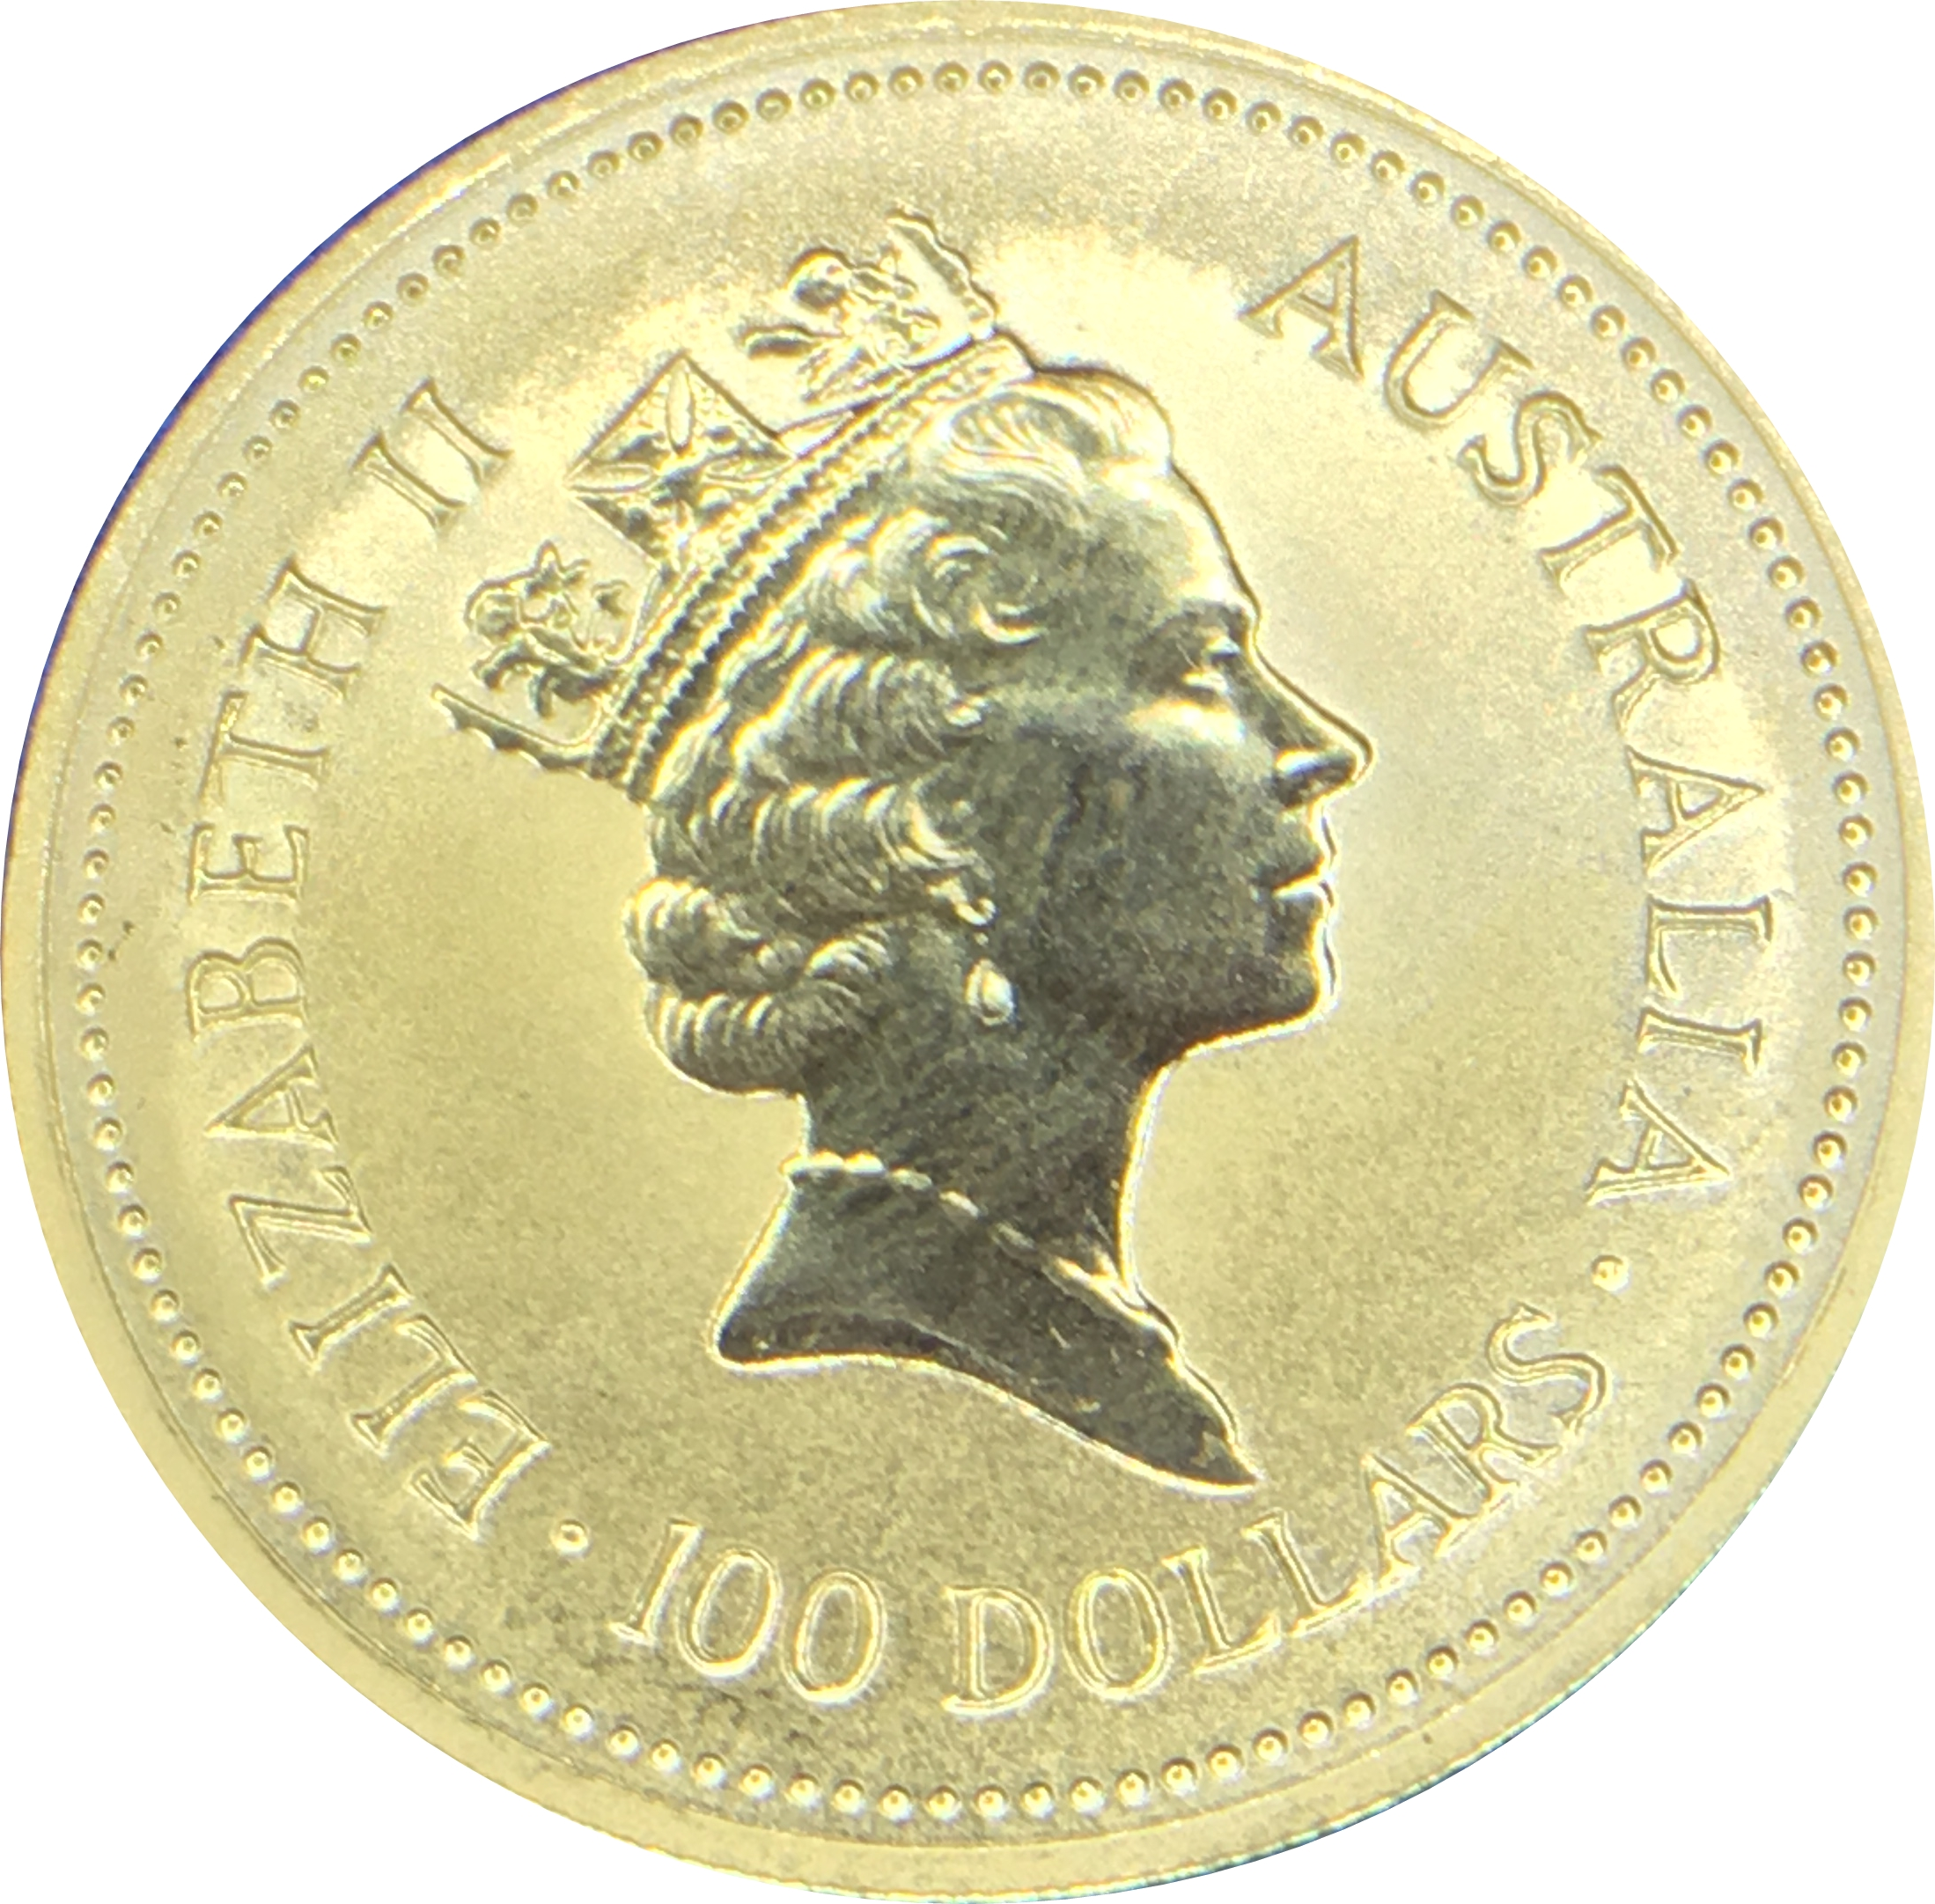 100 Dollars Elizabeth Ii Quot Australian Nugget Quot Gold